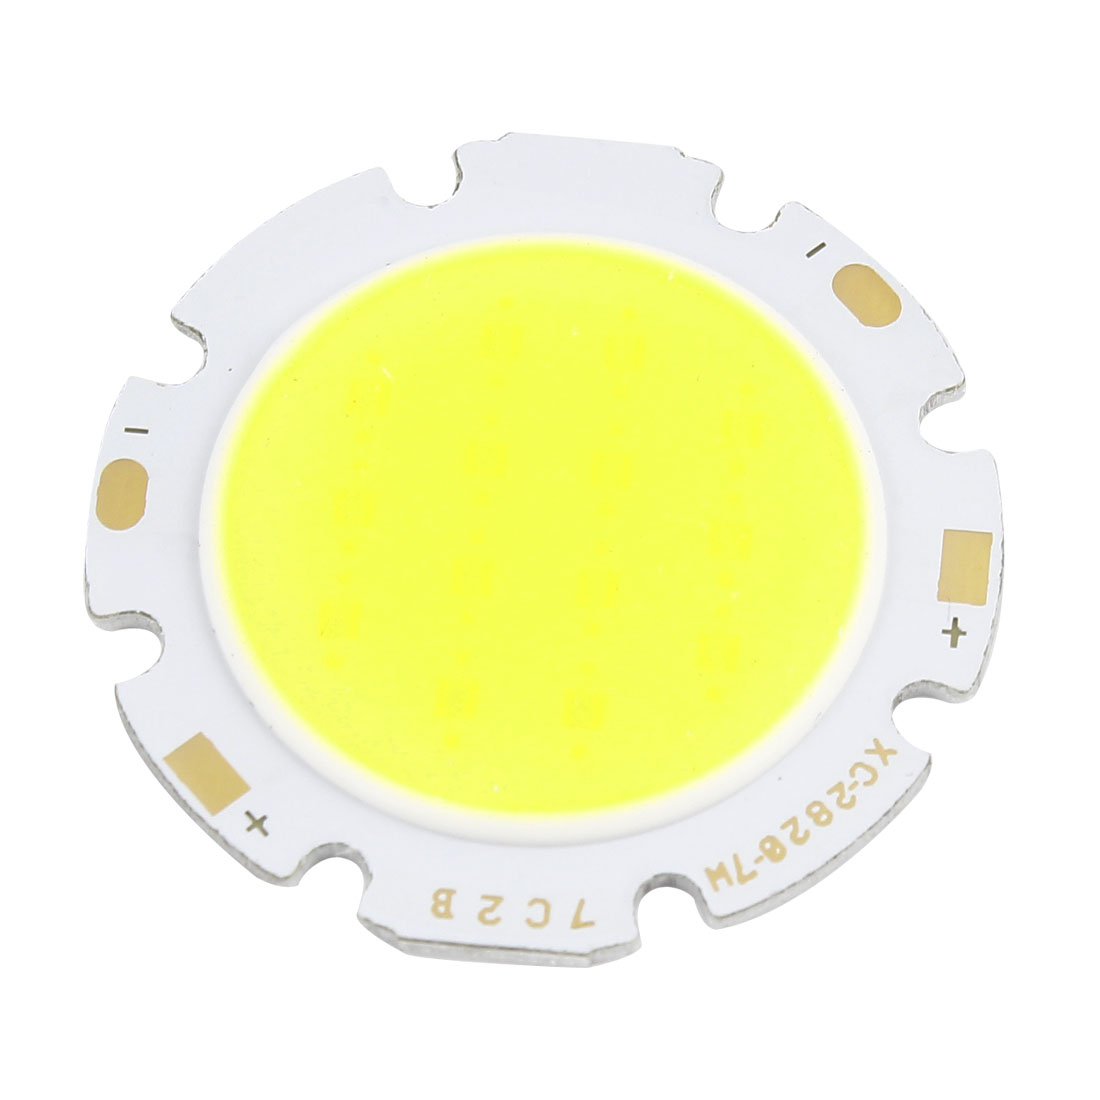 21-22V 300mA 7W Pure White Light High Power SMD COB LED Lamp Chip Bulb